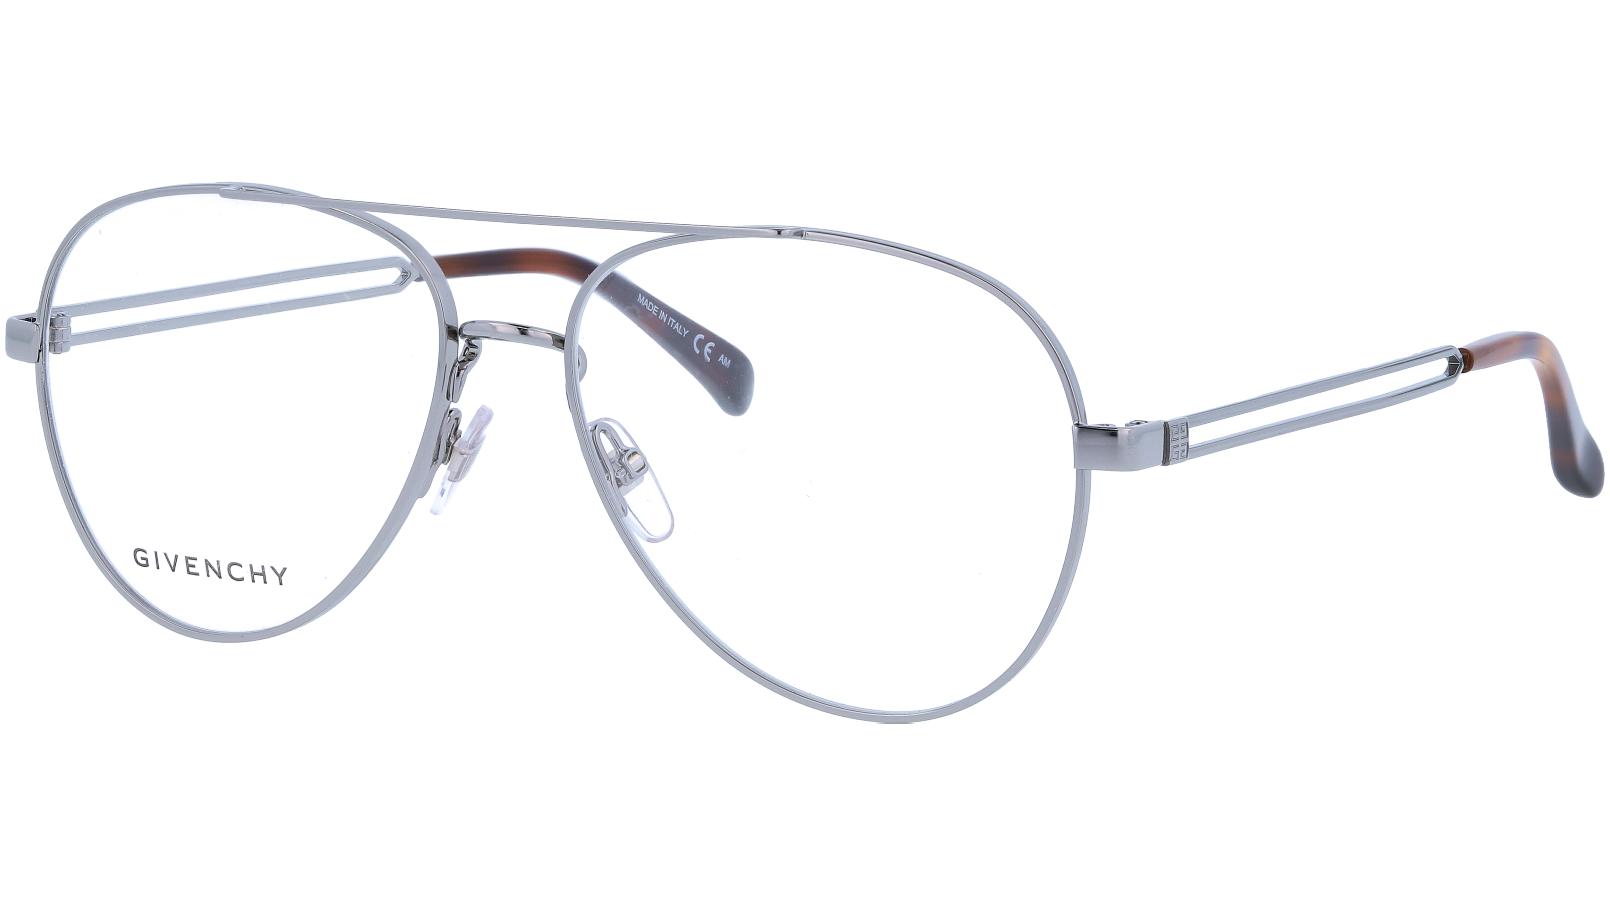 GIVENCHY GV0095 6LB 56 RUTHENIUM Glasses